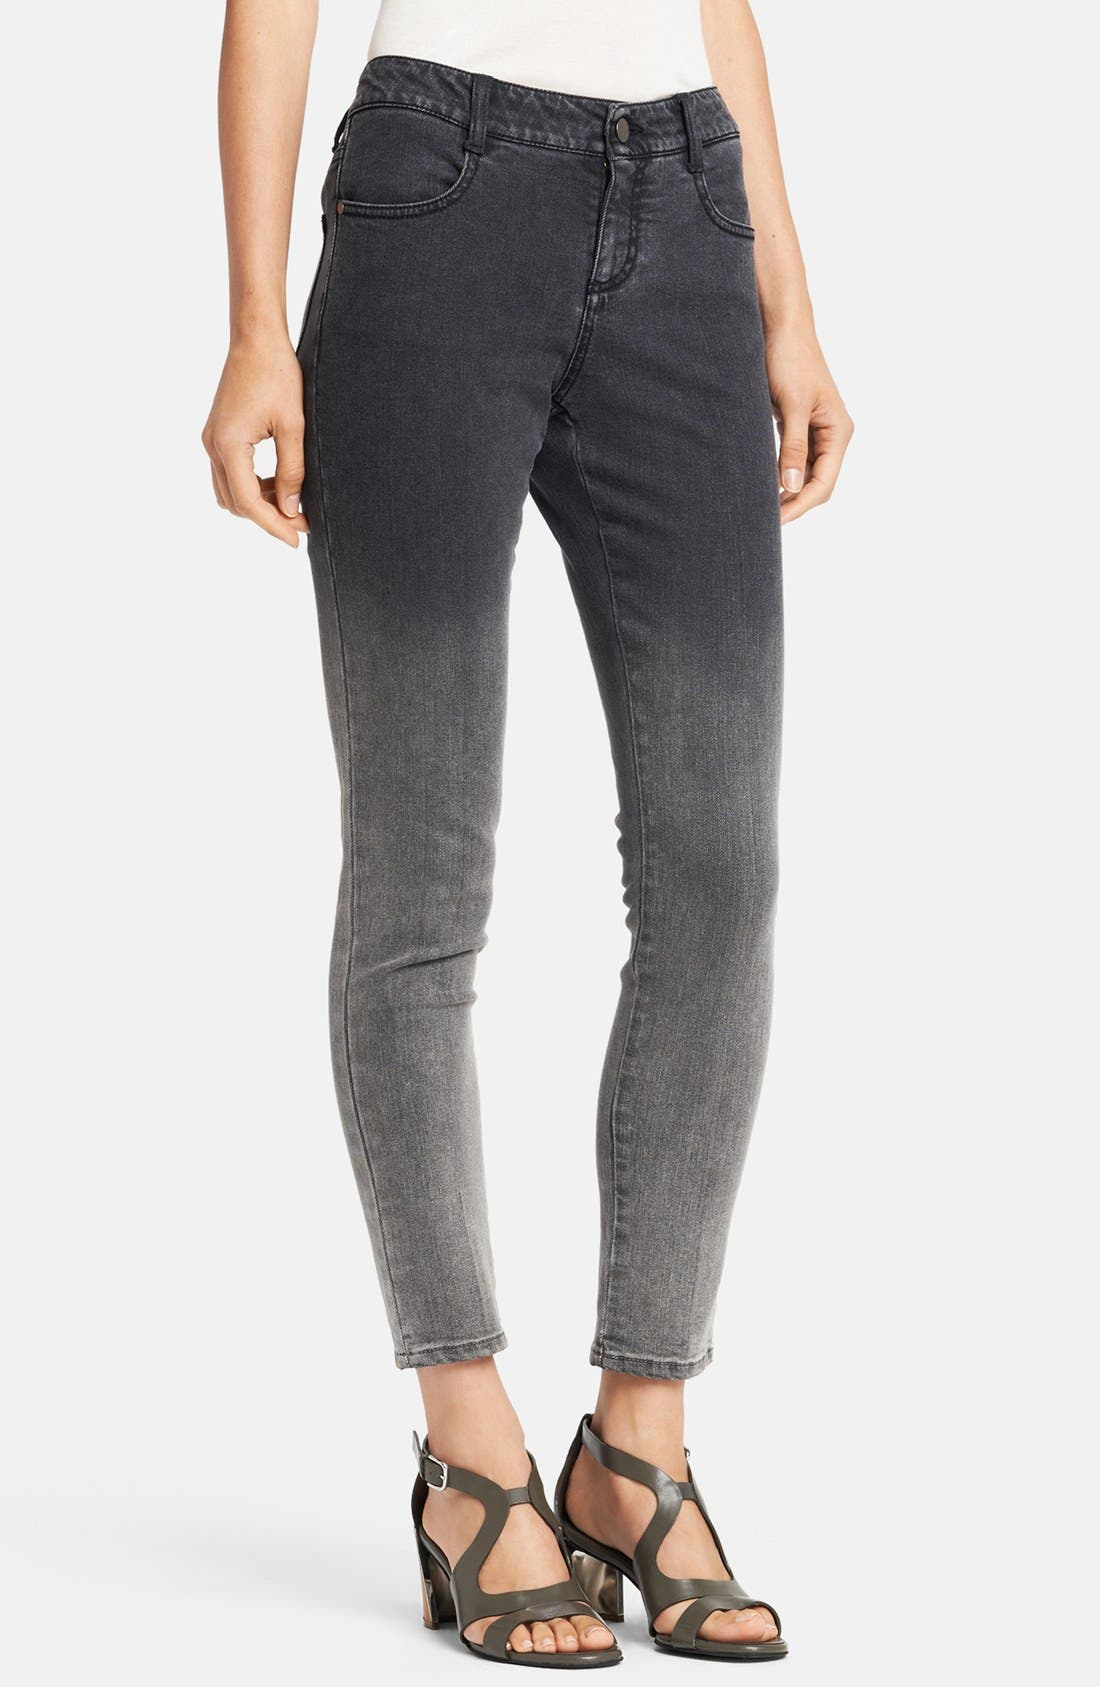 Alternate Image 1 Selected - Stella McCartney 'Simone' Dégradé Skinny Ankle Grazer Jeans